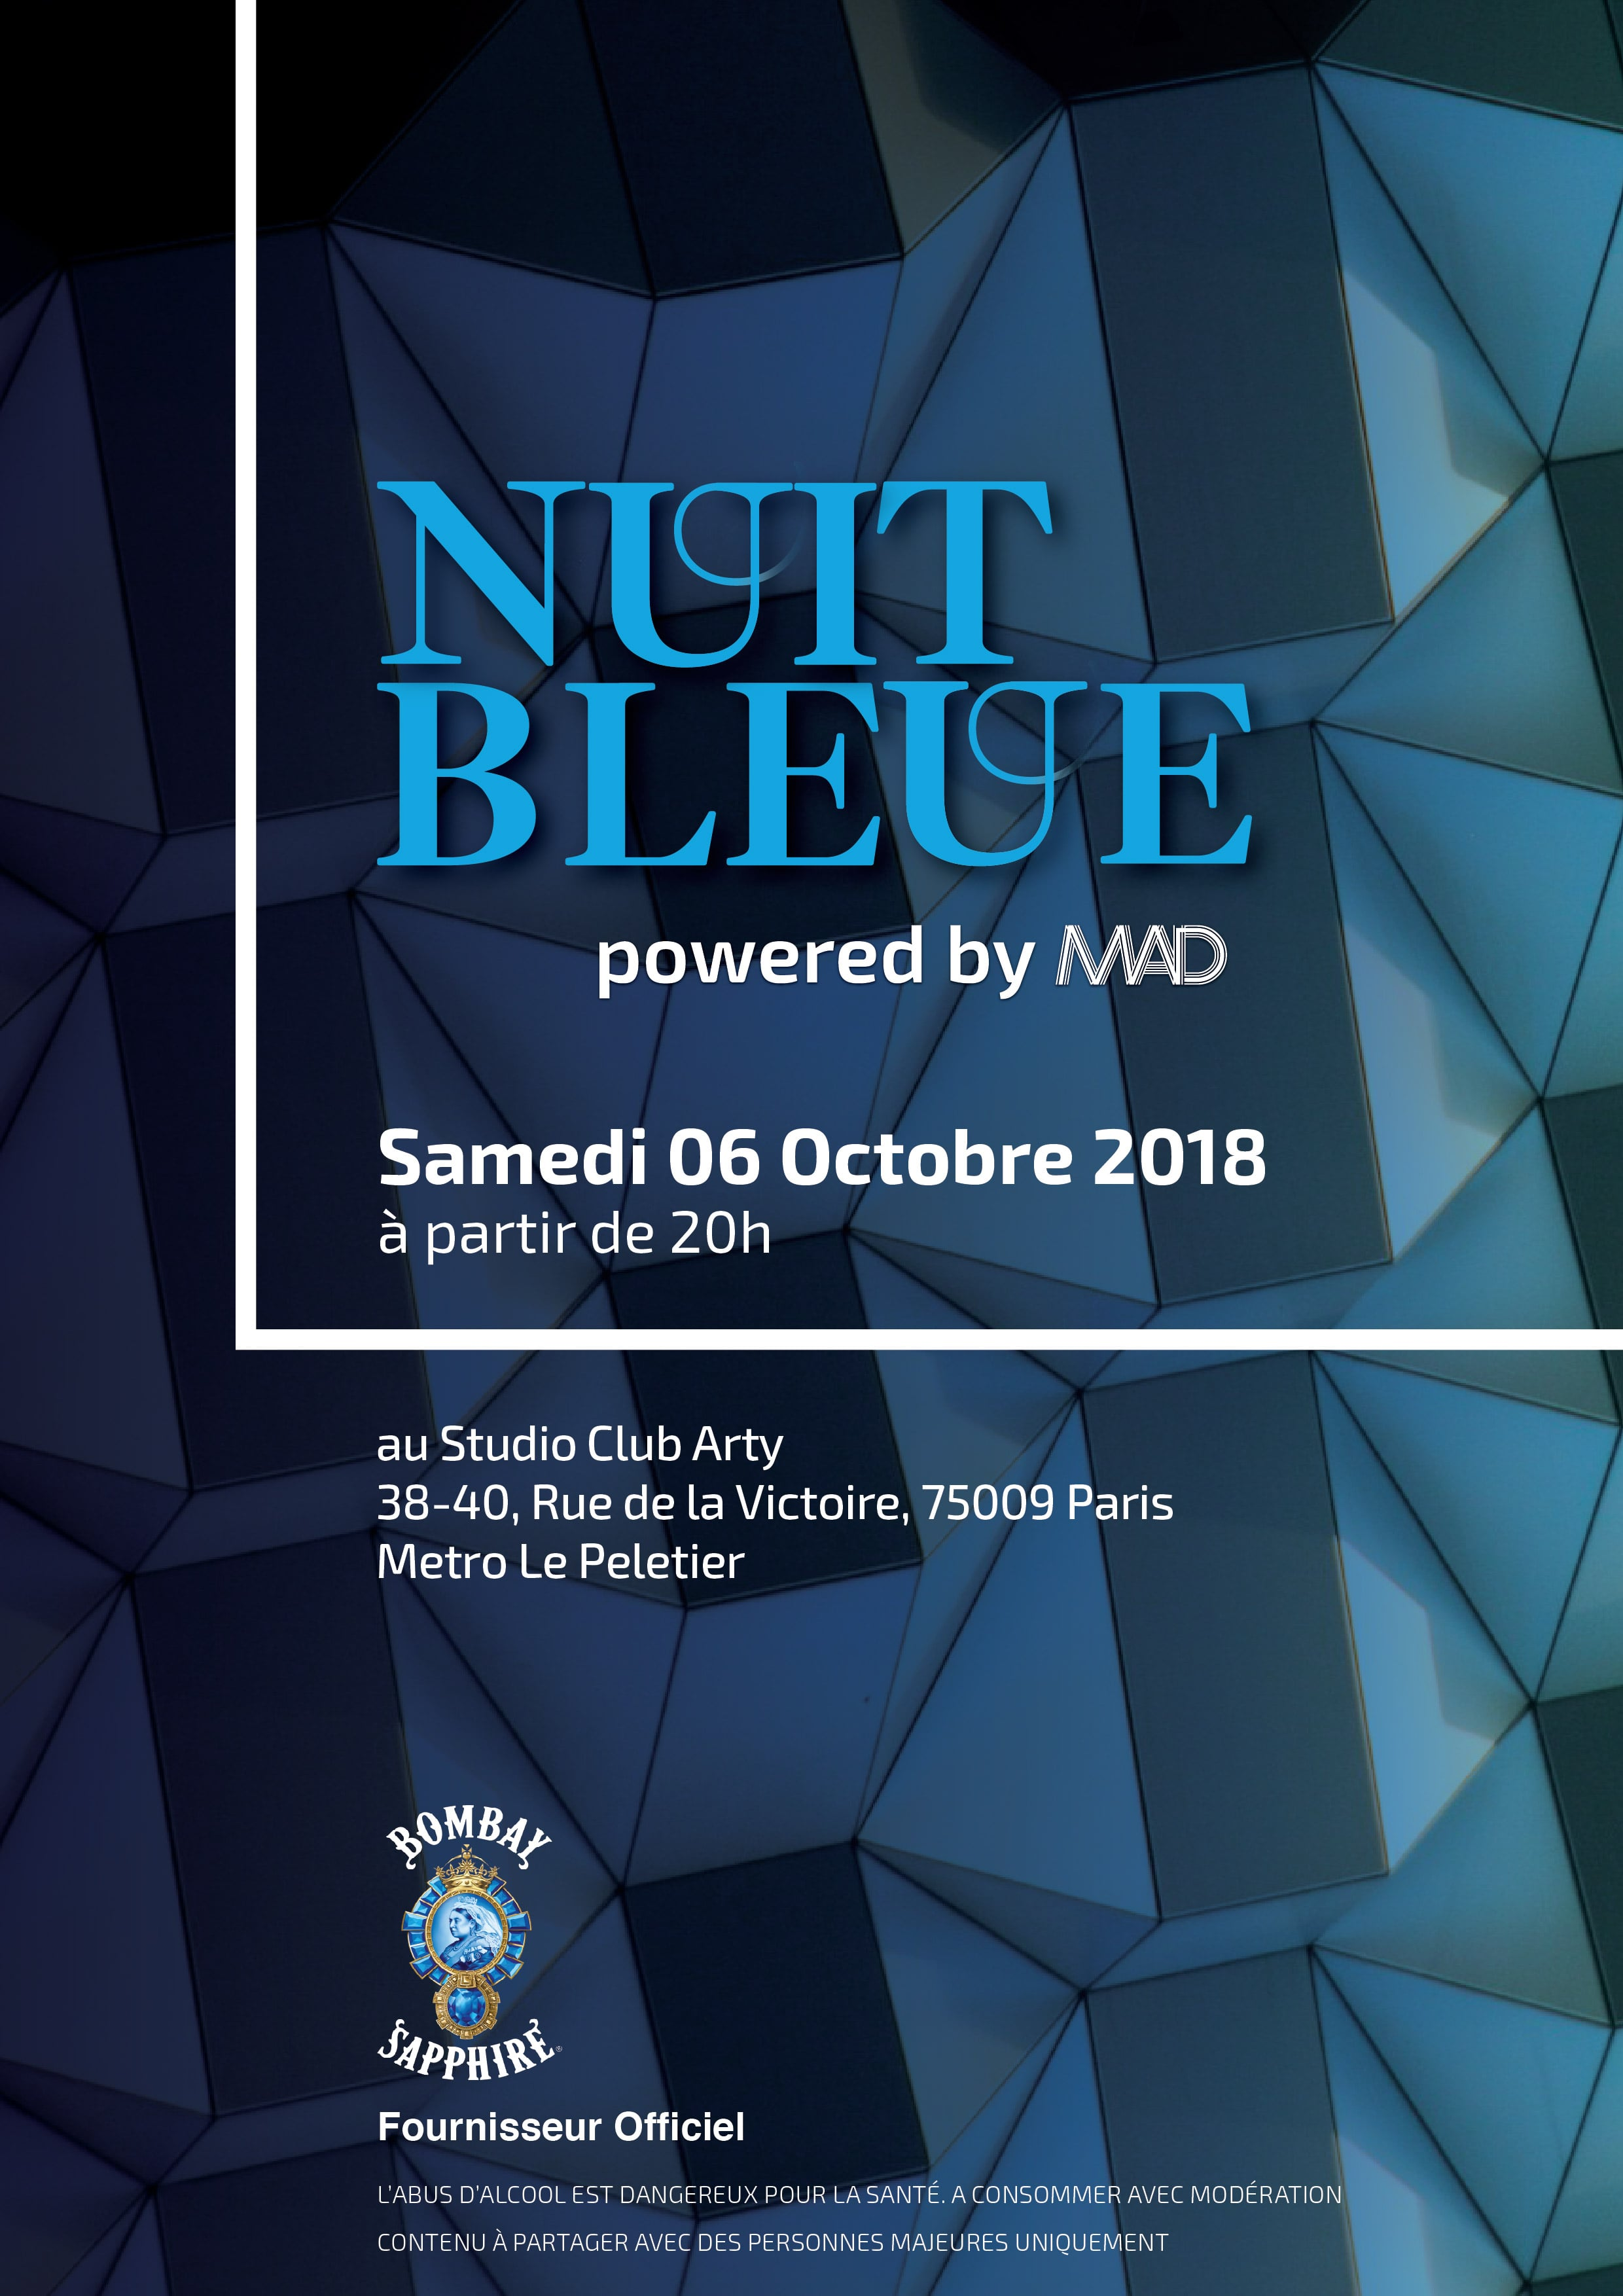 Bombay Sapphire Nuit Bleue